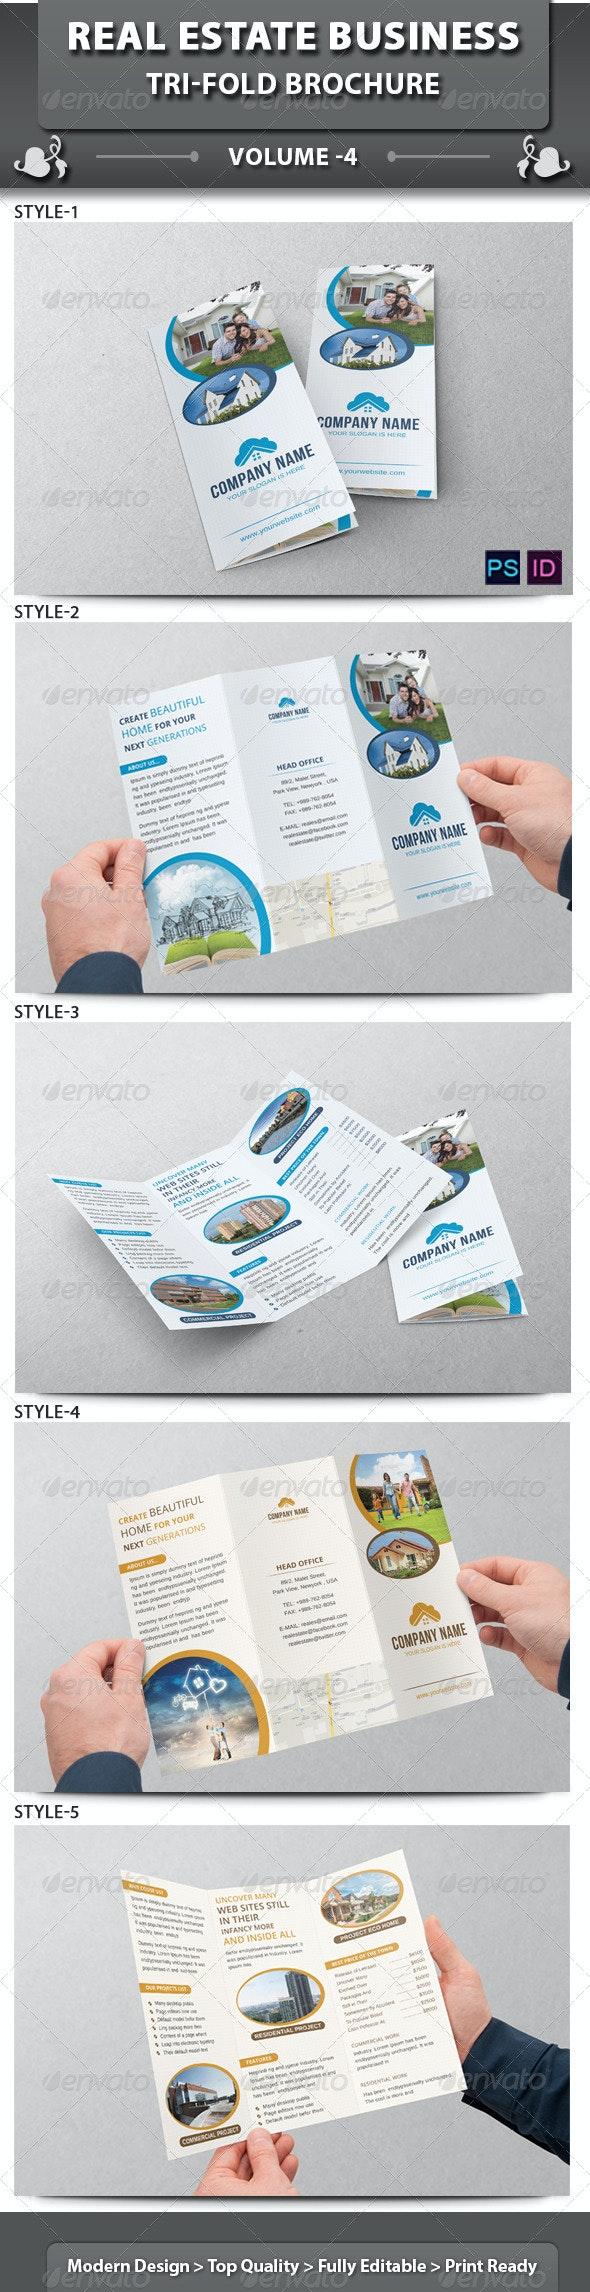 Real Estate Business Tri-fold Brochure | Volume 4 - Corporate Brochures